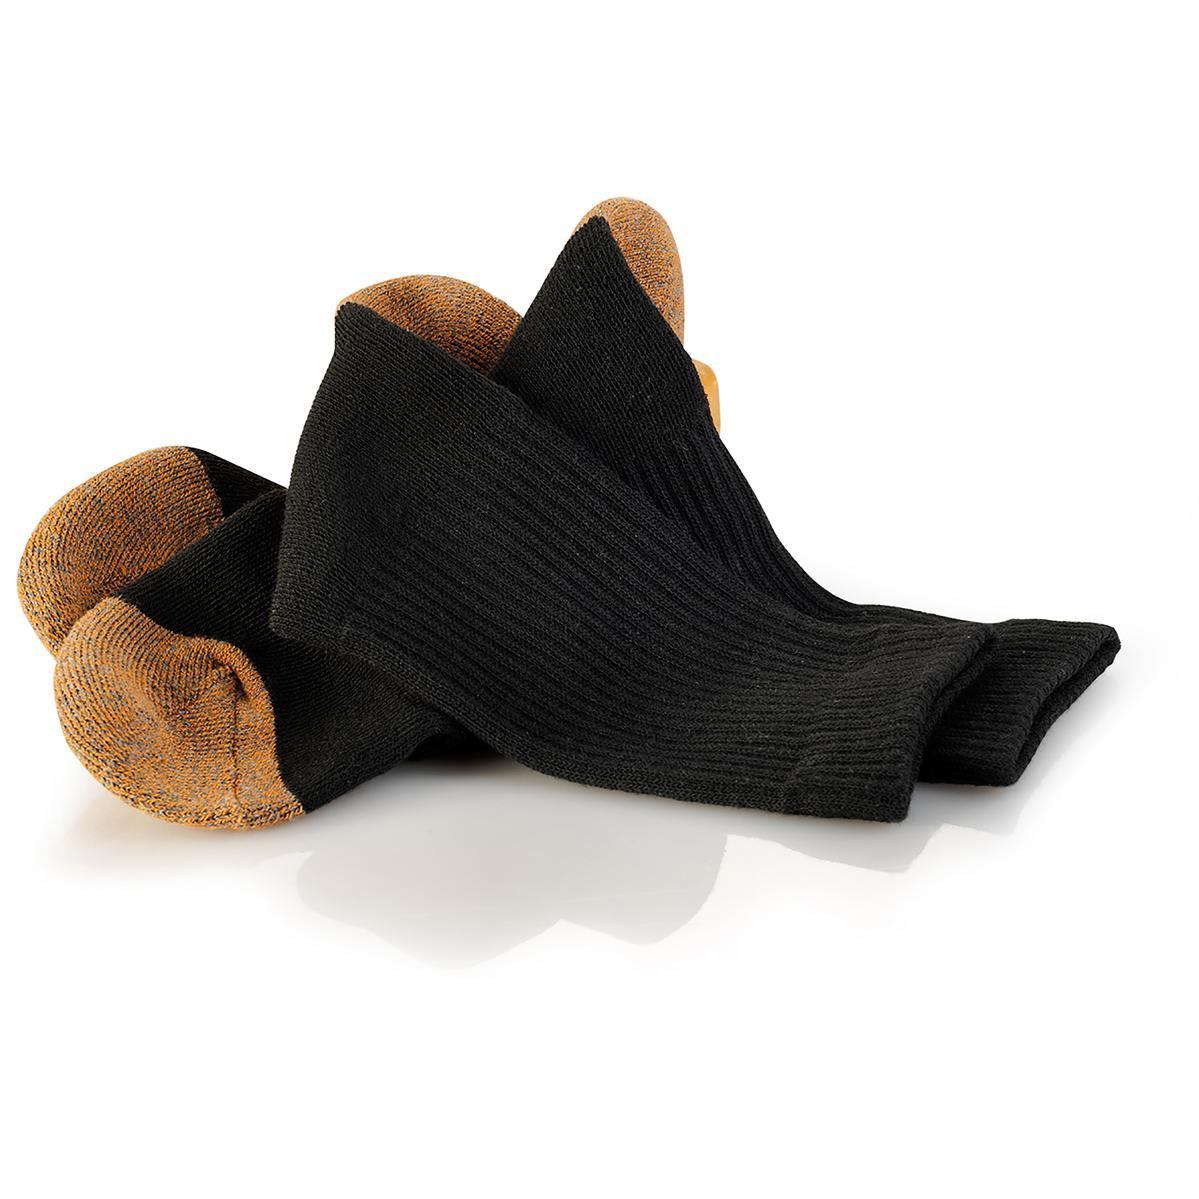 Scruffs Worker 3 Pack Of Socks Black